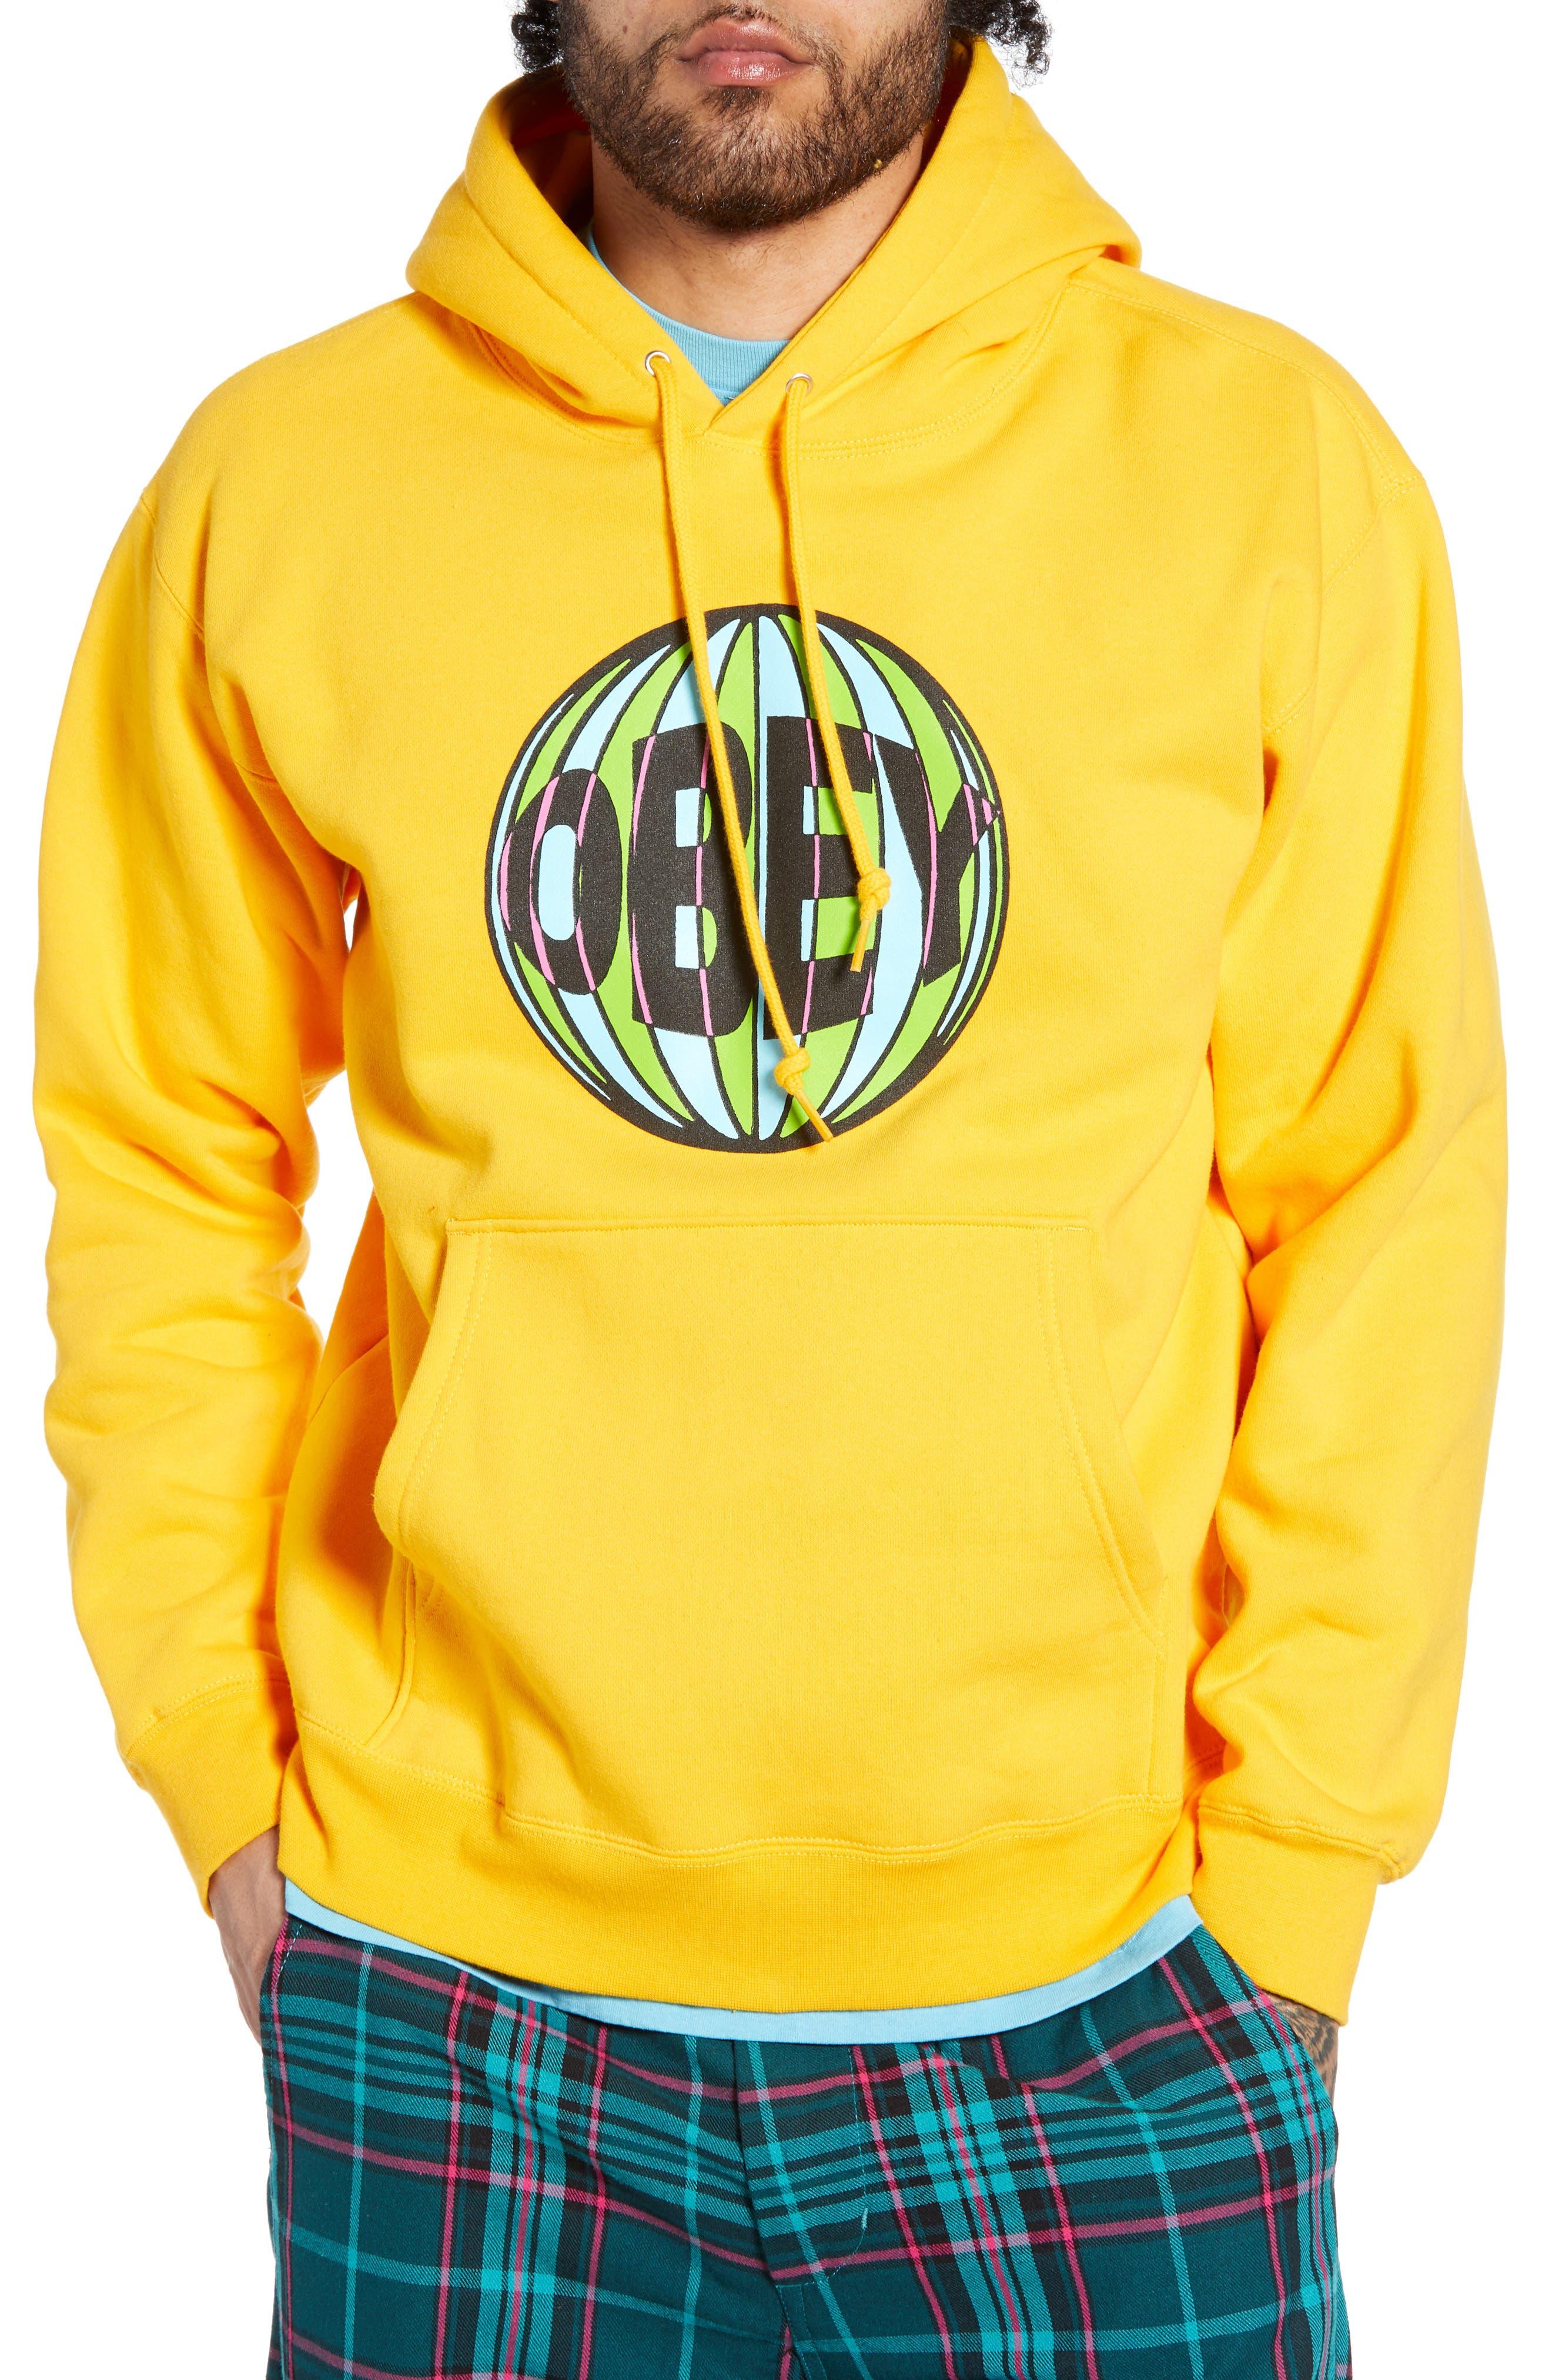 OBEY, Ball Hooded Sweatshirt, Main thumbnail 1, color, GOLD